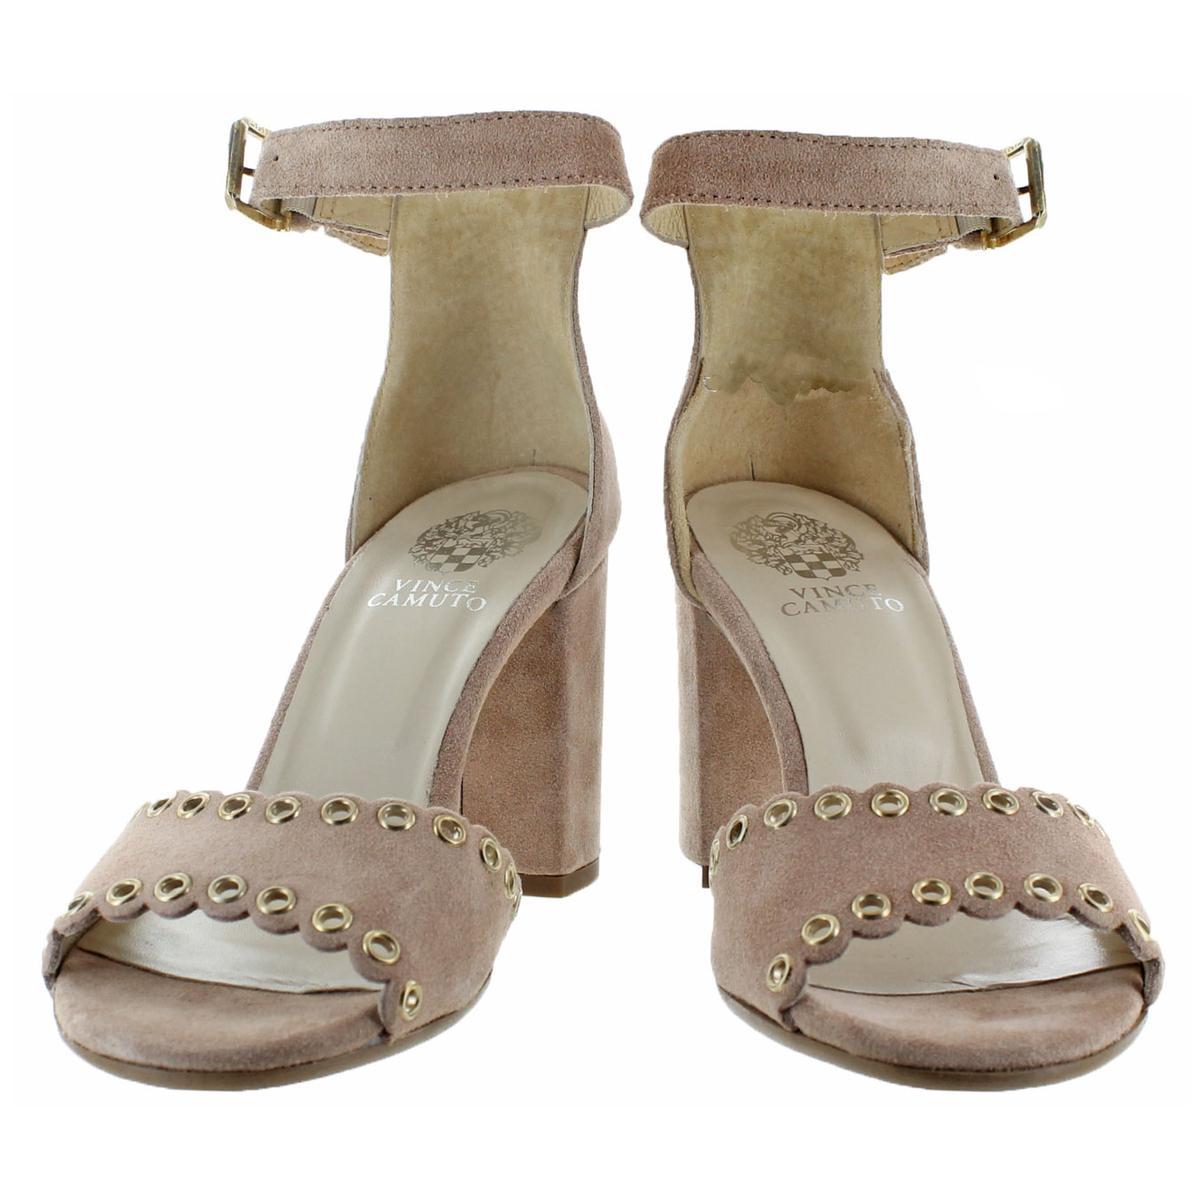 Vince-Camuto-Missy-Women-039-s-Suede-Open-Toe-Block-Heel-Dressy-Sandal-Shoes thumbnail 7